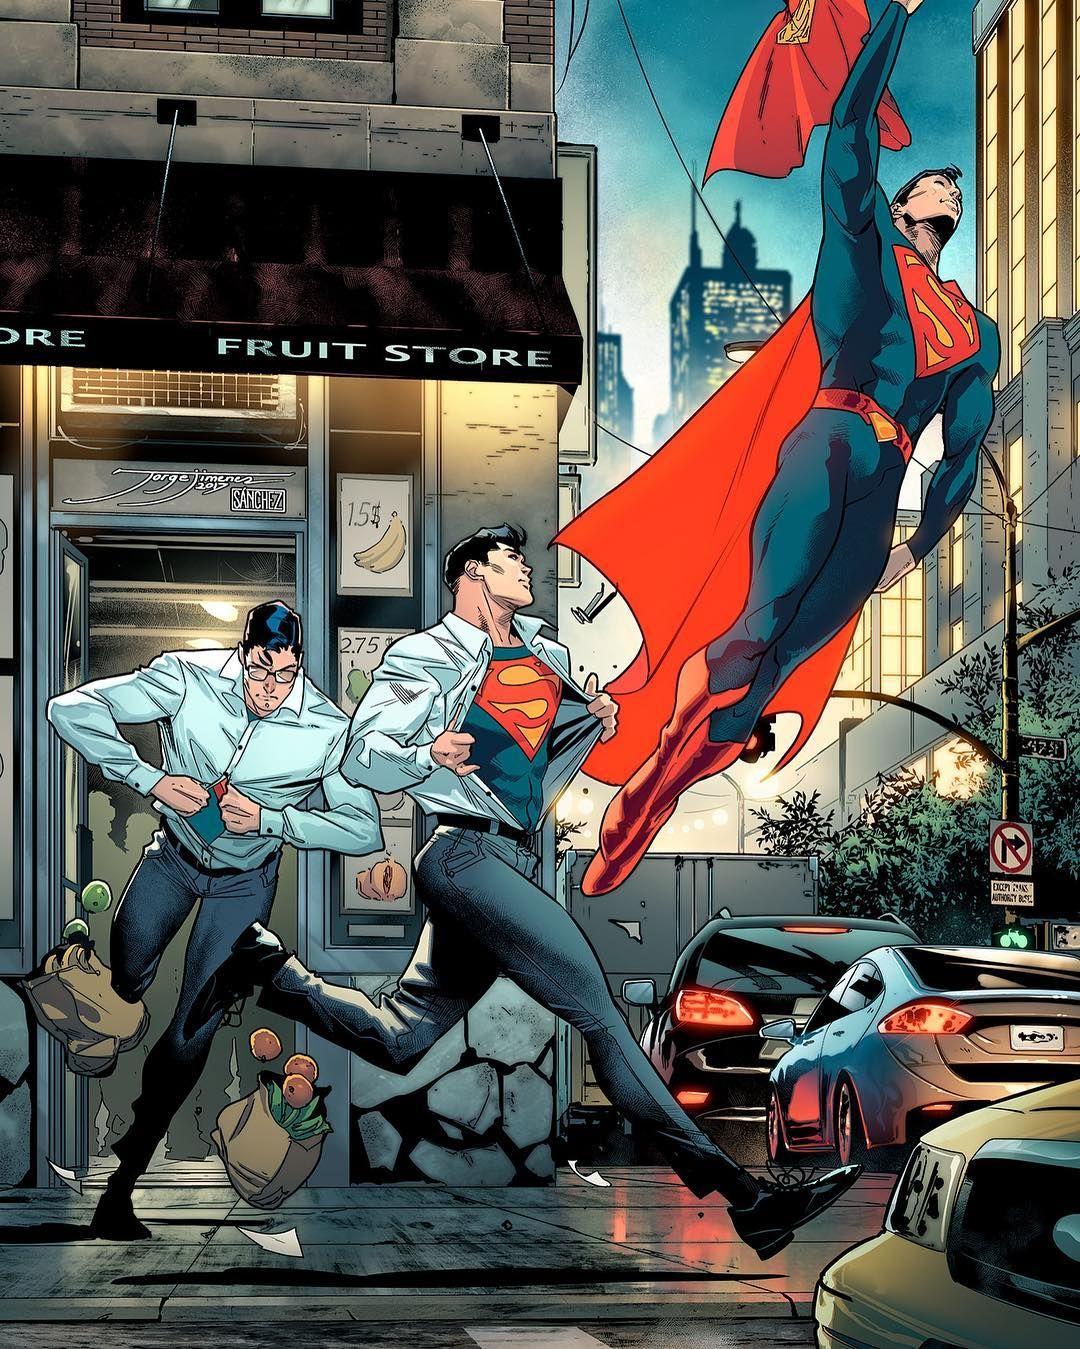 Superman Love Strobic Action Panels Like These By Jorge Jimenez Jorge Jimenez Comicbookartist On Instagram This Lo Superman Comic Superman Art Superman